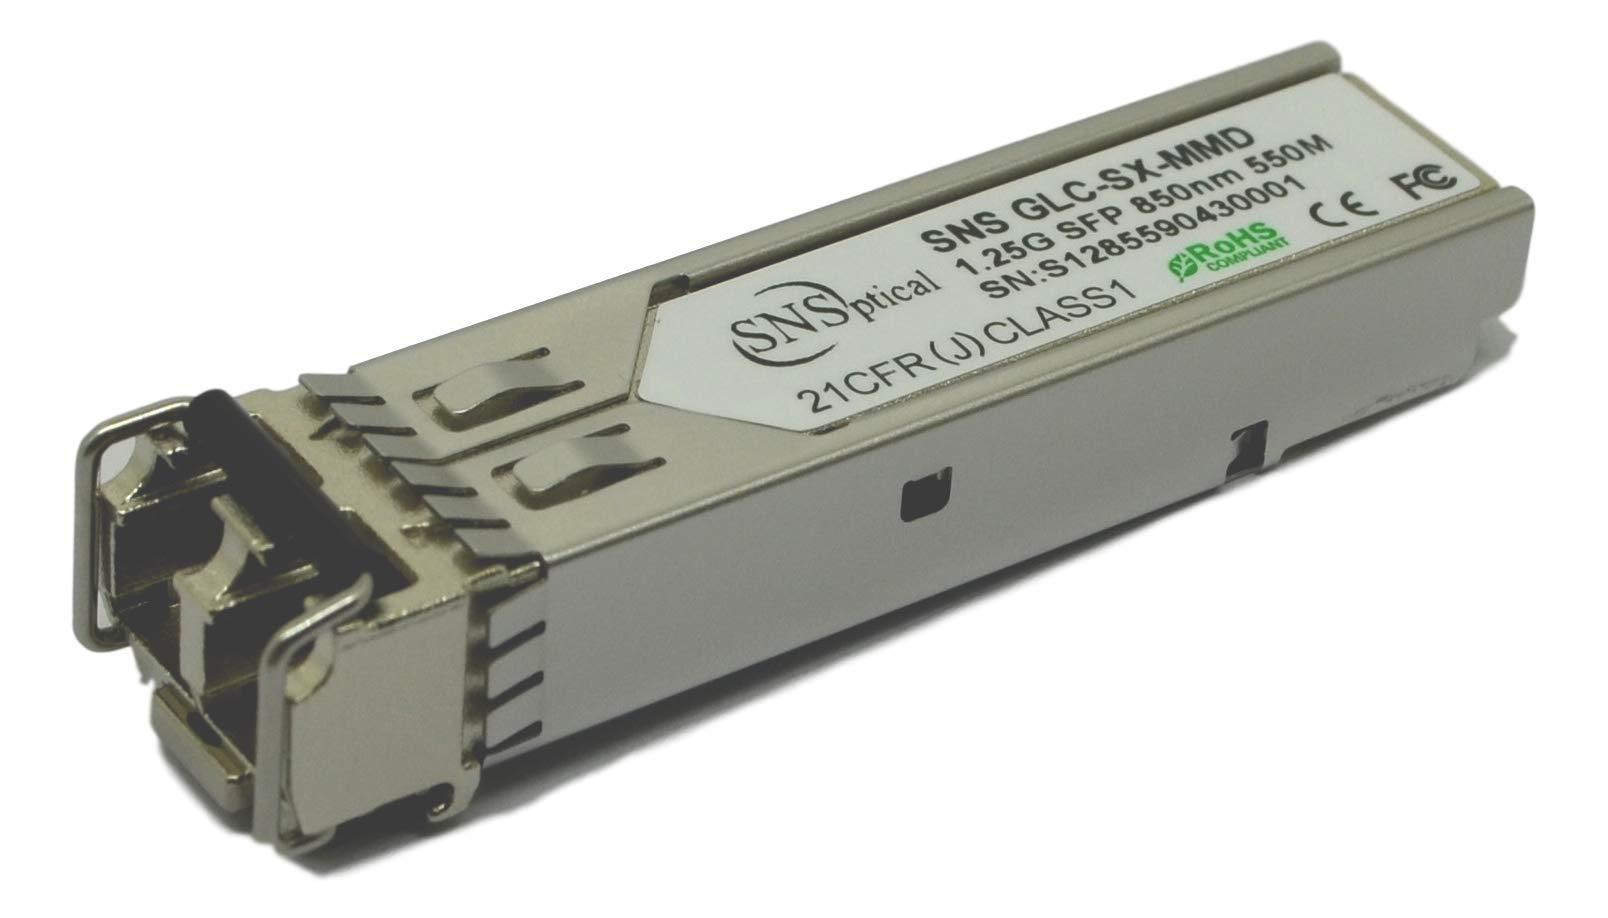 Optical SNS at-SPSX Allied Telesis at-SPSX Compatible 1000BASE-SX SFP Transceiver Module